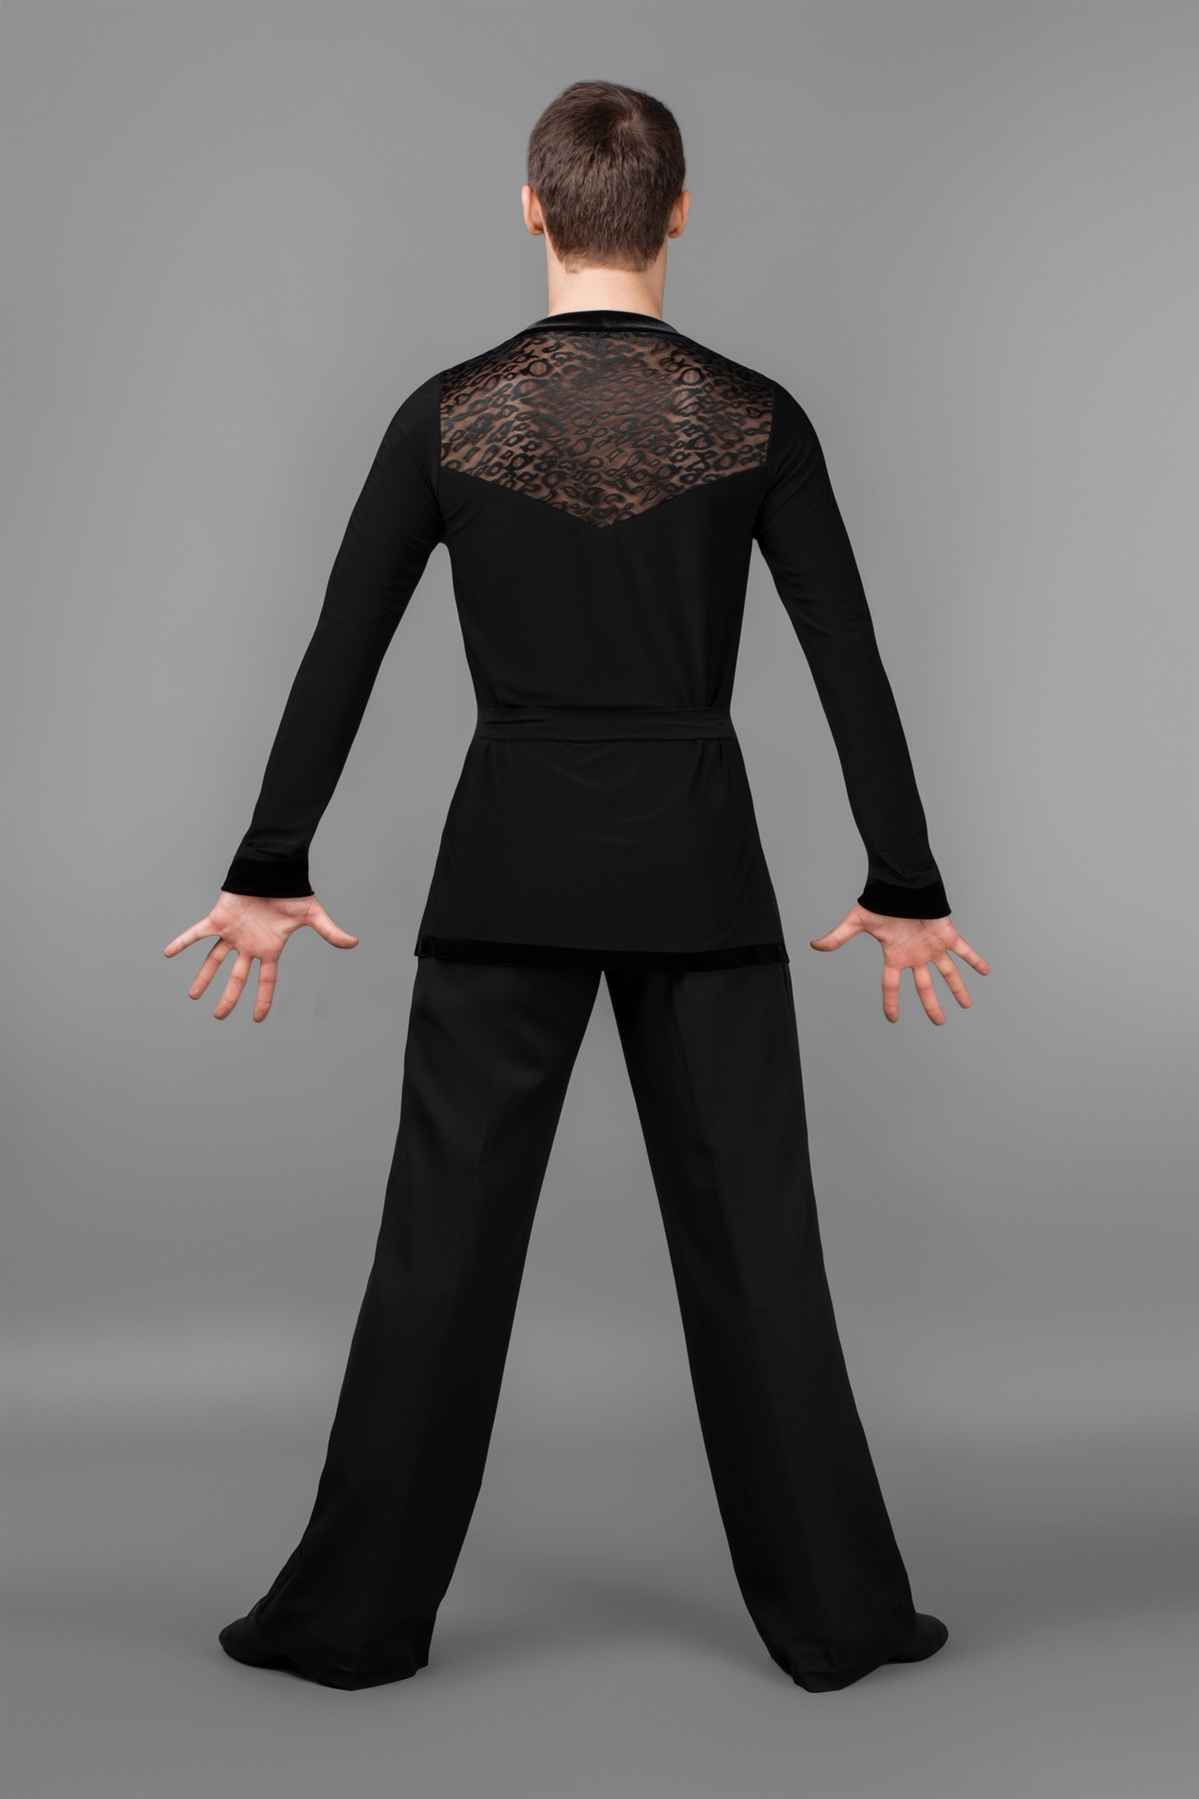 b8158495b Men's Wear Out Latin Dance Shirt